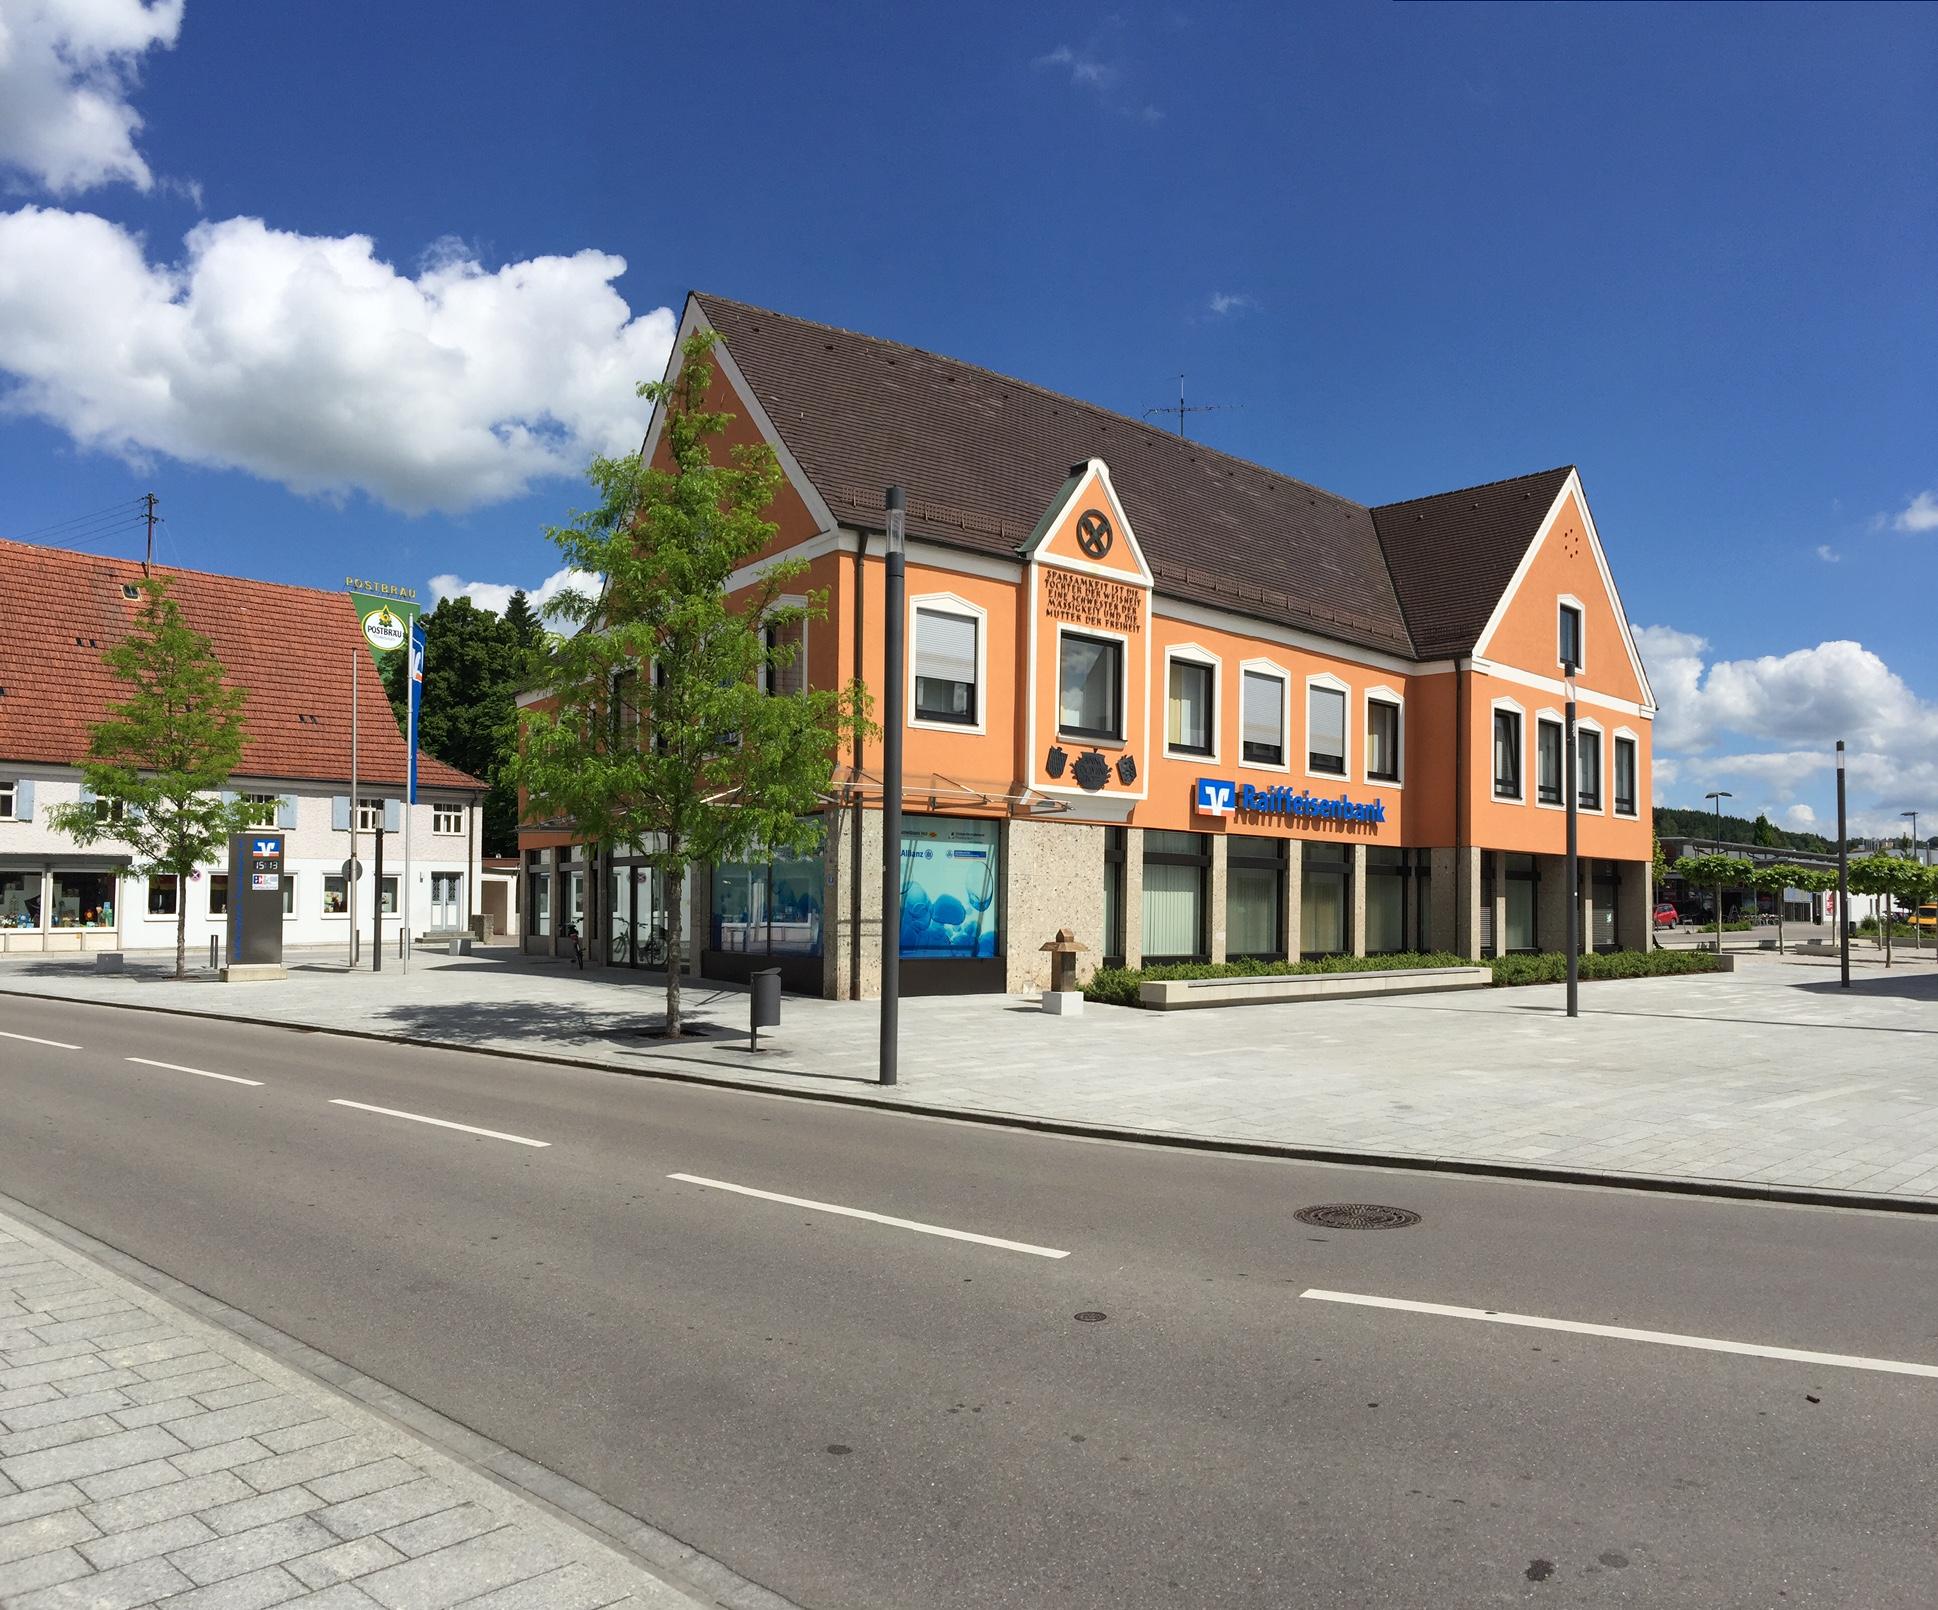 Foto de Hauptstelle Thannhausen